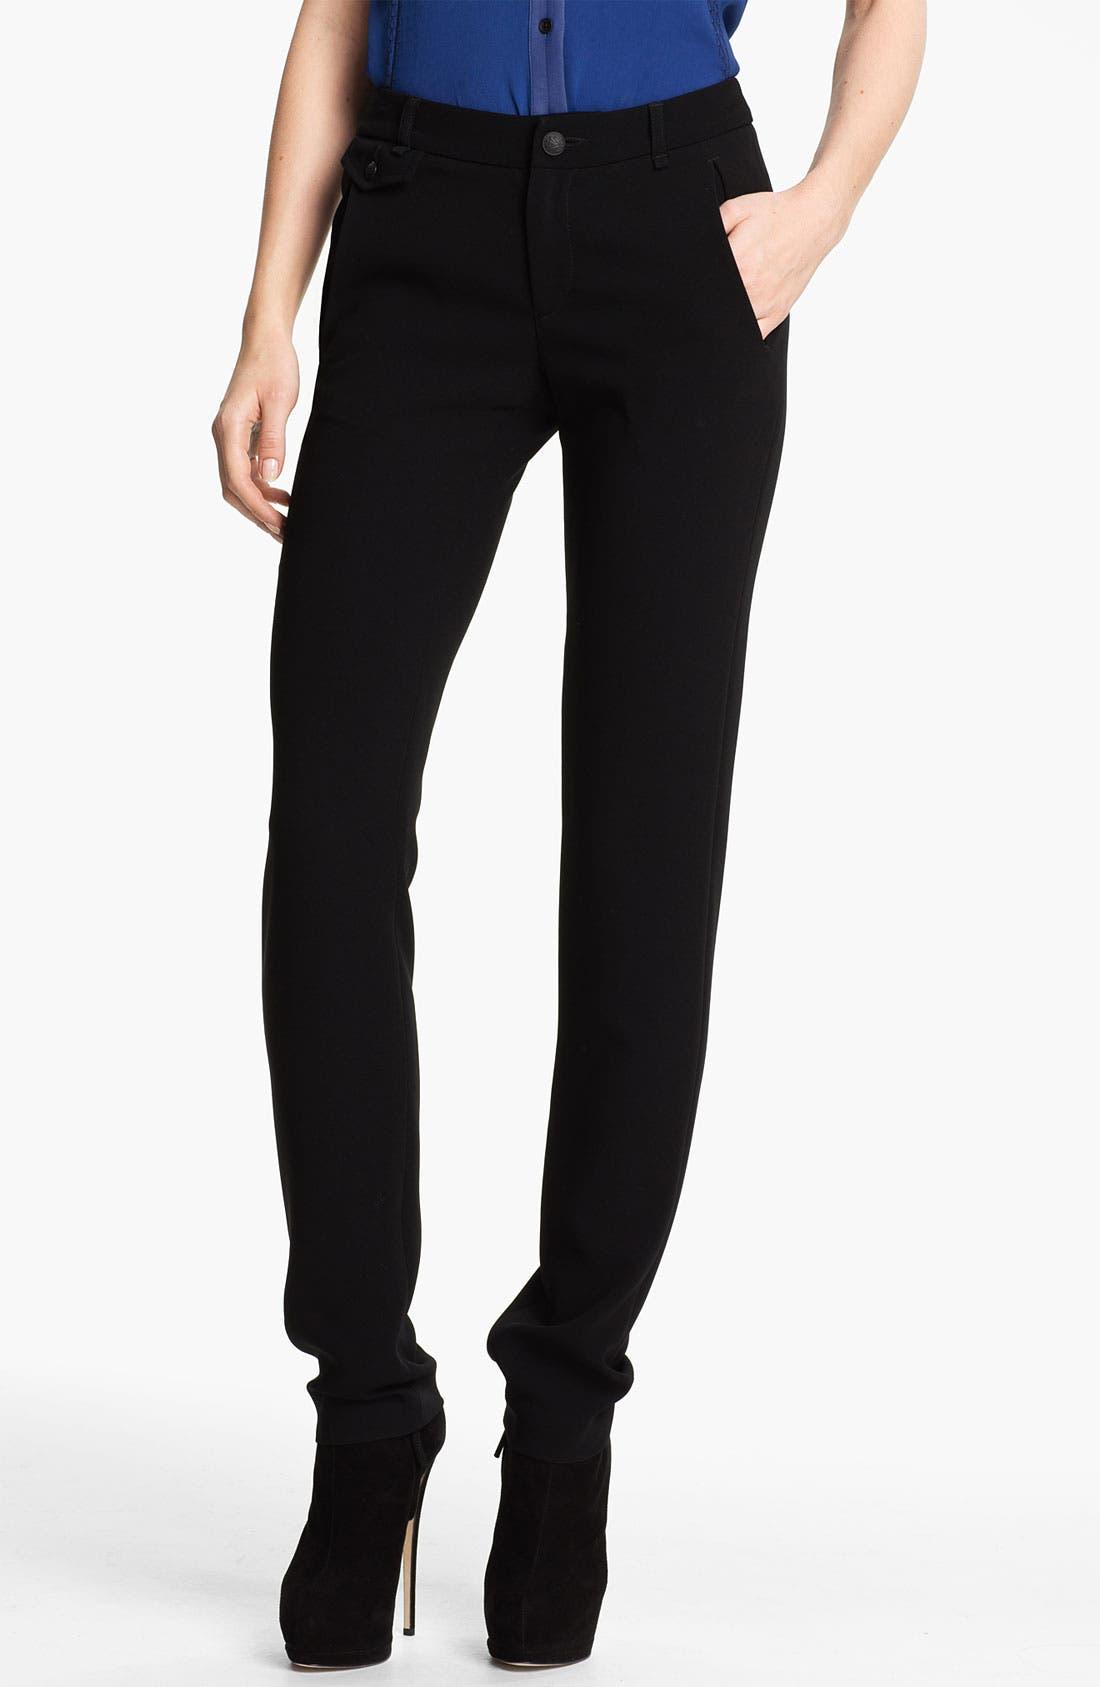 Alternate Image 1 Selected - rag & bone 'Eloise' Pants